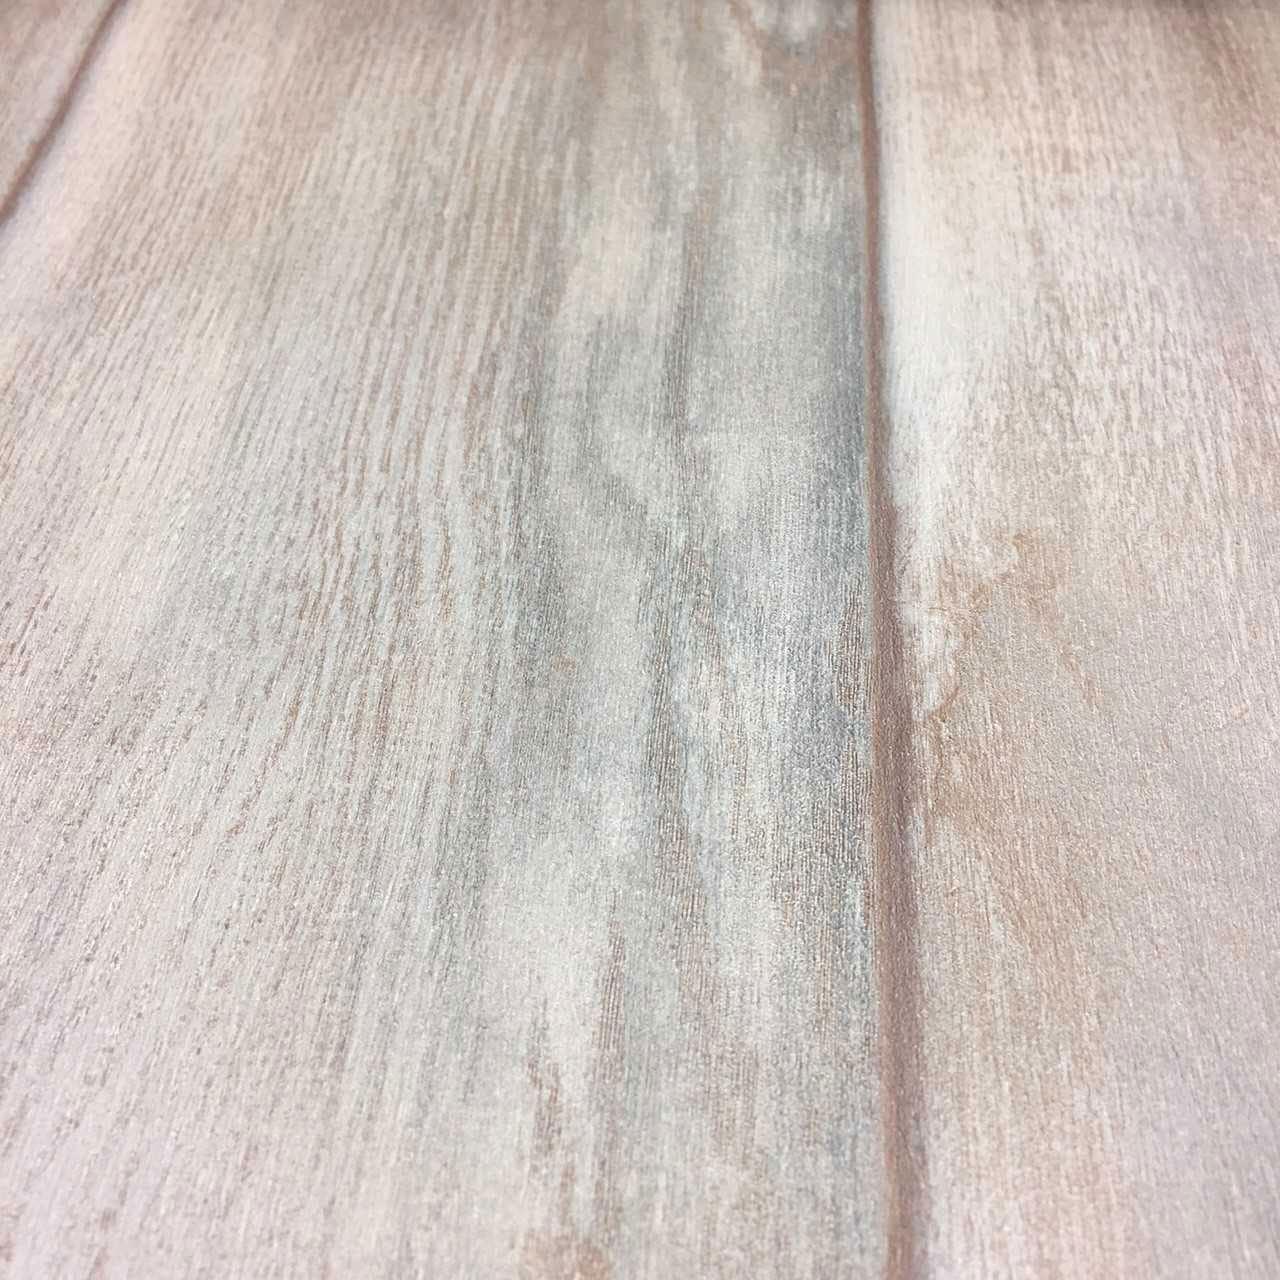 Wood-Effect-Wallpaper-Grains-Boards-Planks-Paste-The-Wall-Vinyl-Koziel-3-Colours thumbnail 11